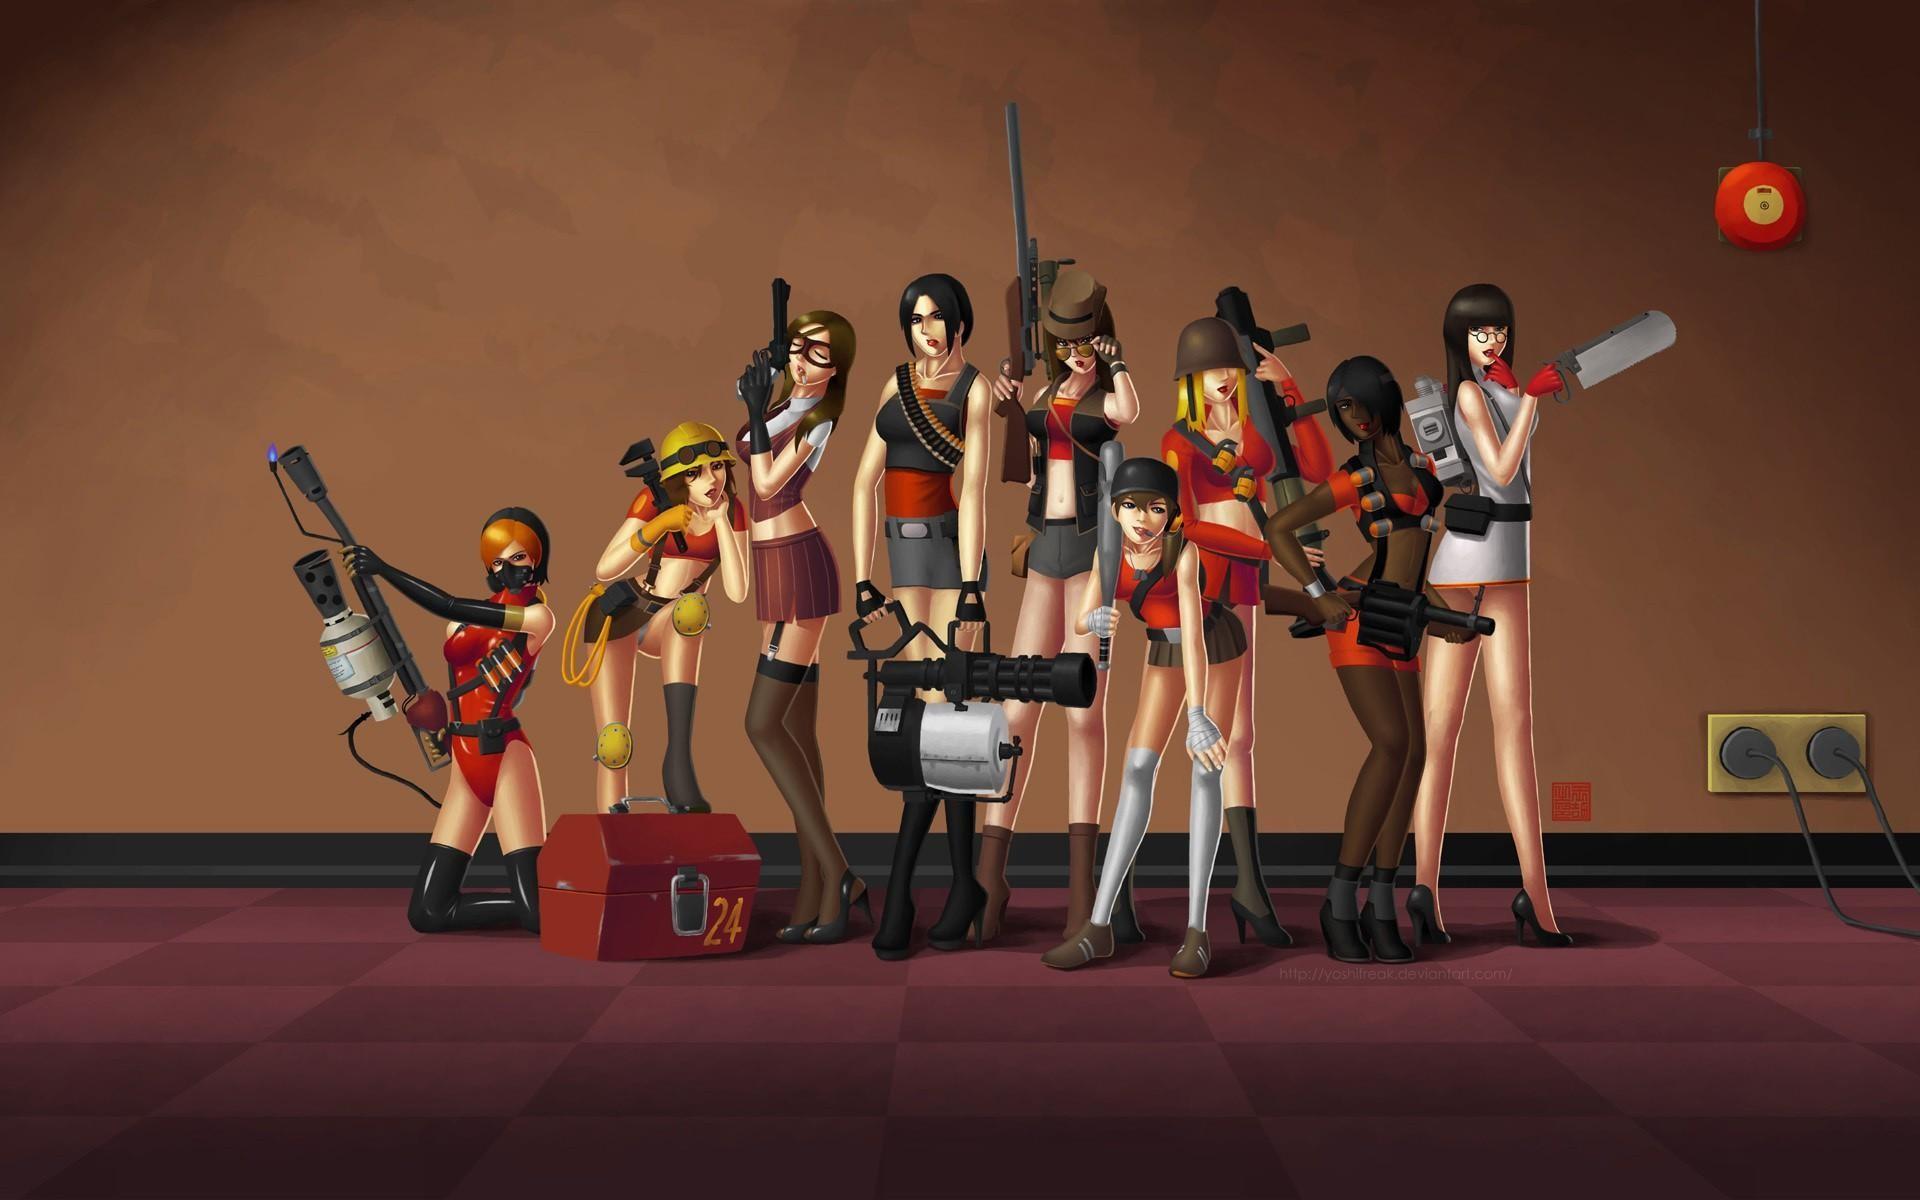 Team-fortress-2-desktop-wallpaper-hd